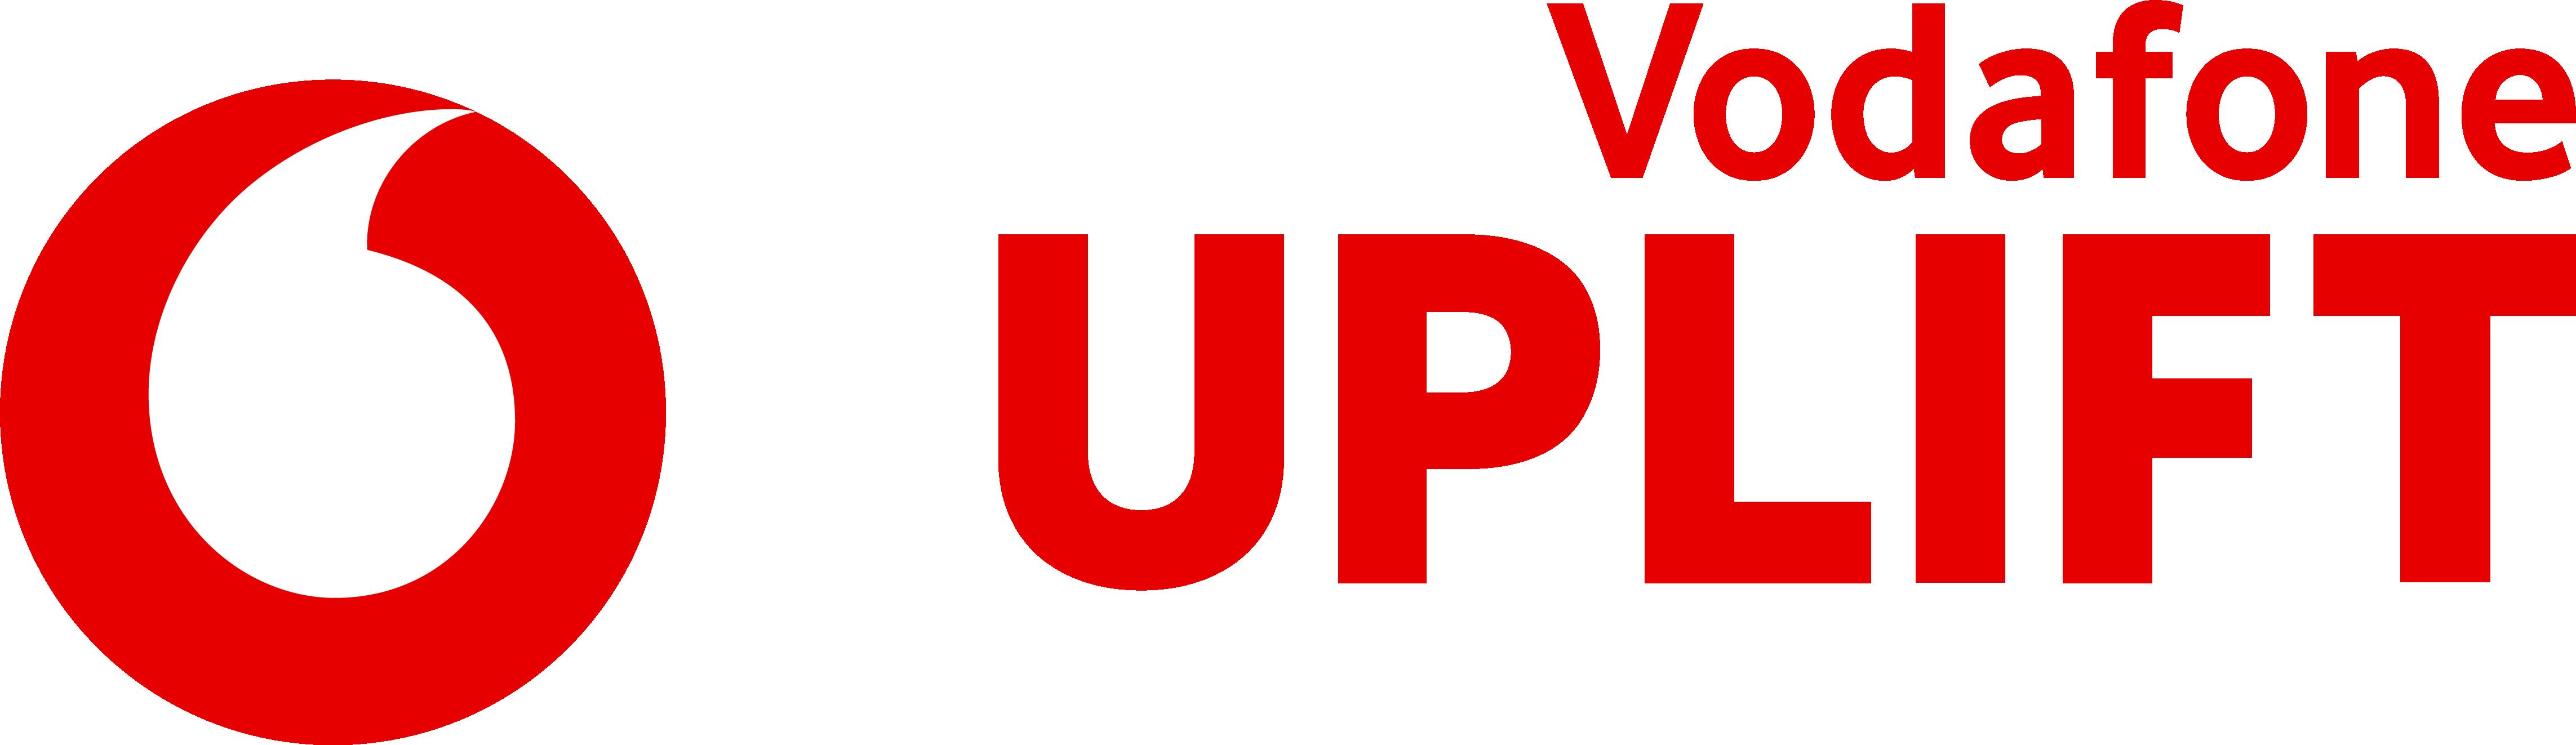 vodafone-uplift